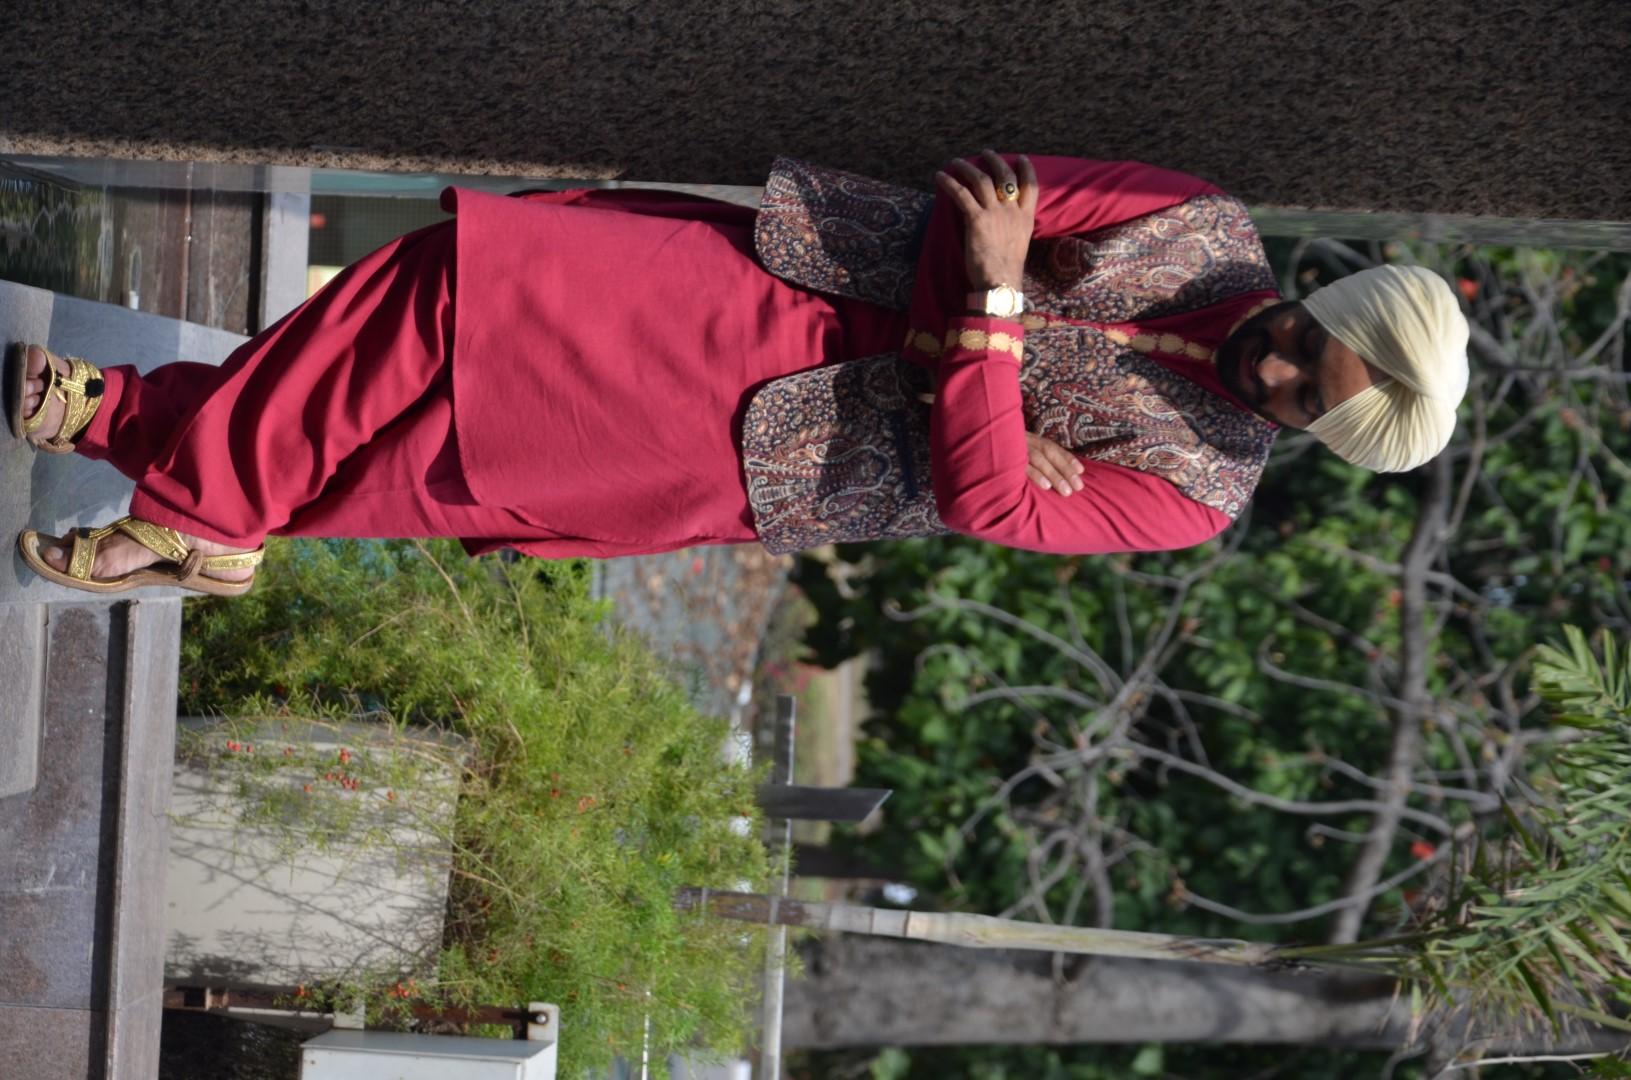 satinder sartaj posing 4 nazaarey wala munda